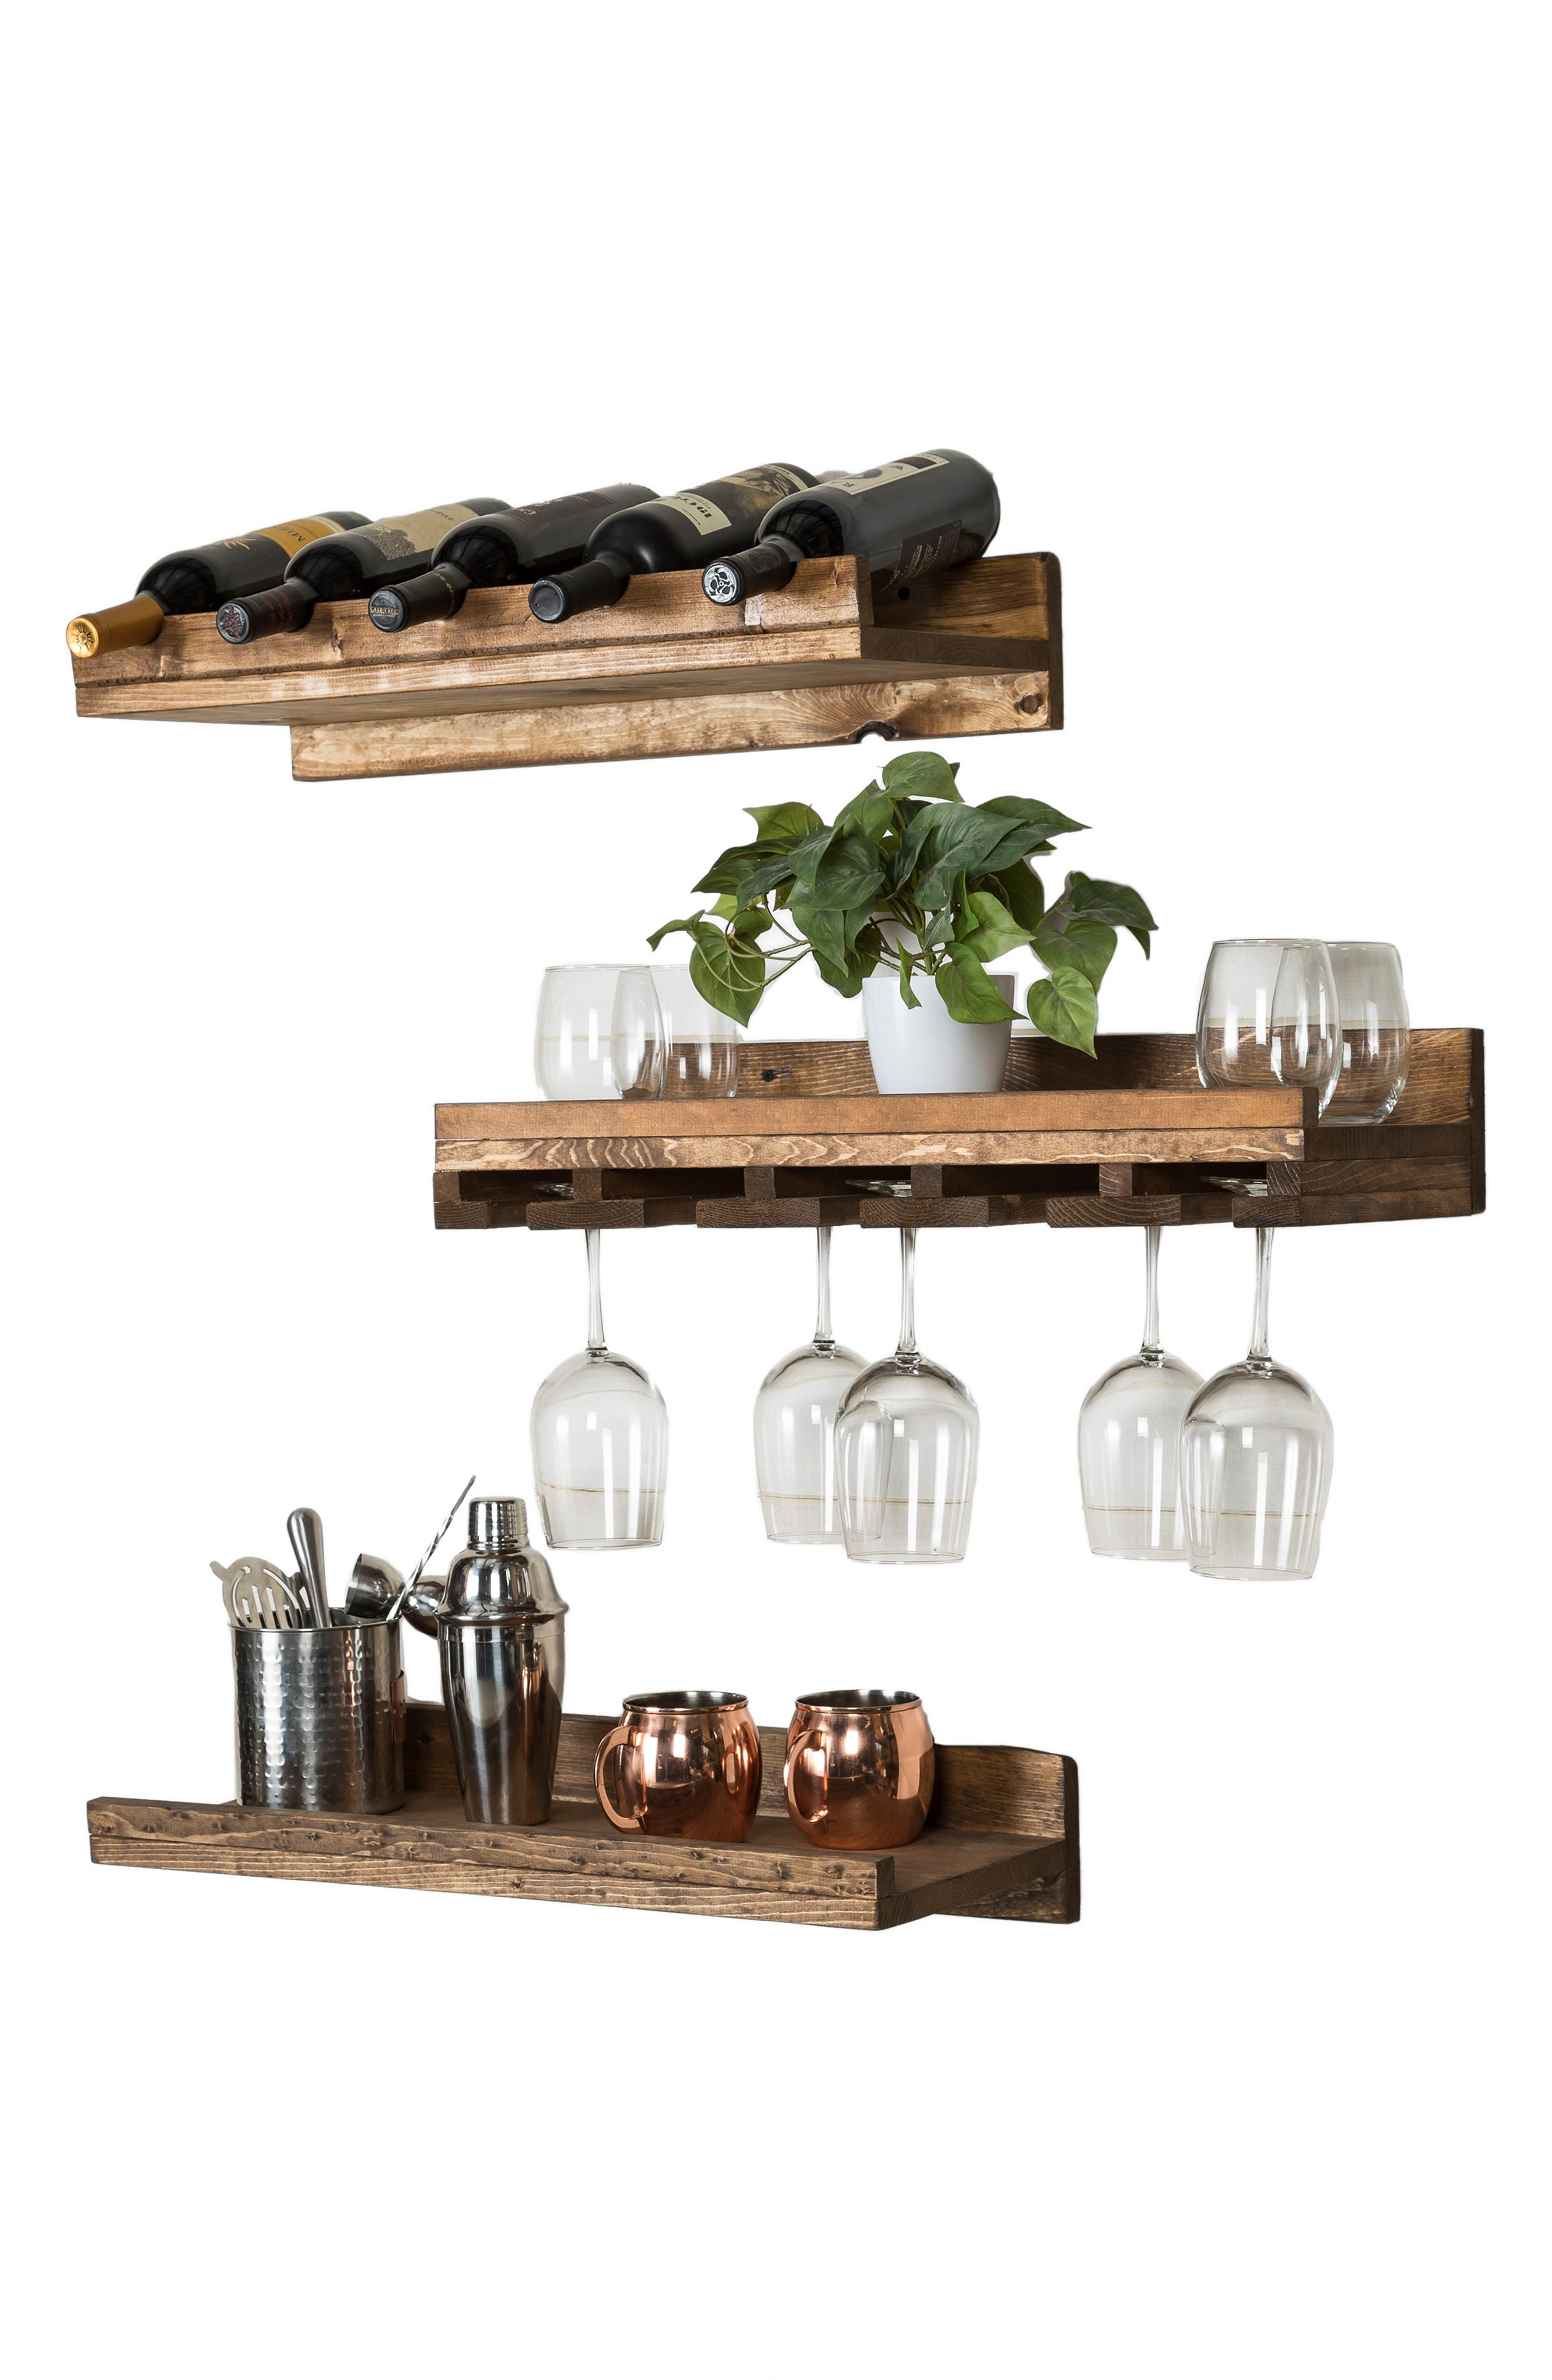 Set of 3 Pine Wood Wine Racks,                             Alternate thumbnail 8, color,                             200